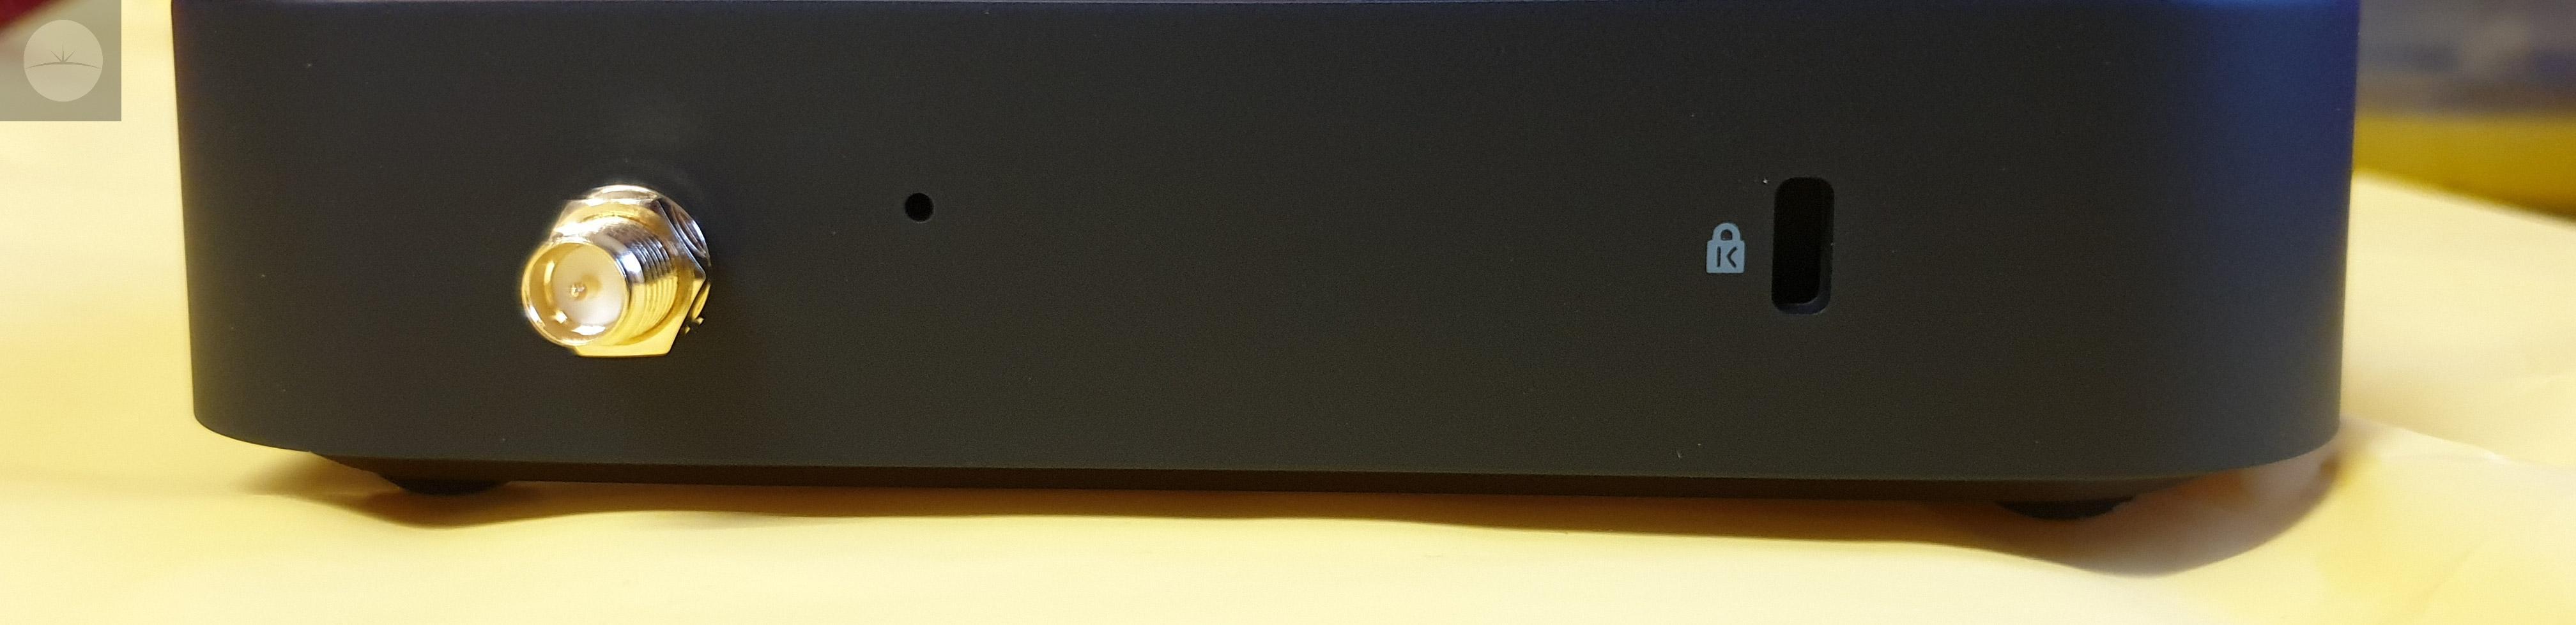 Minix Z83-4U Ubuntu fanless mini PC Review